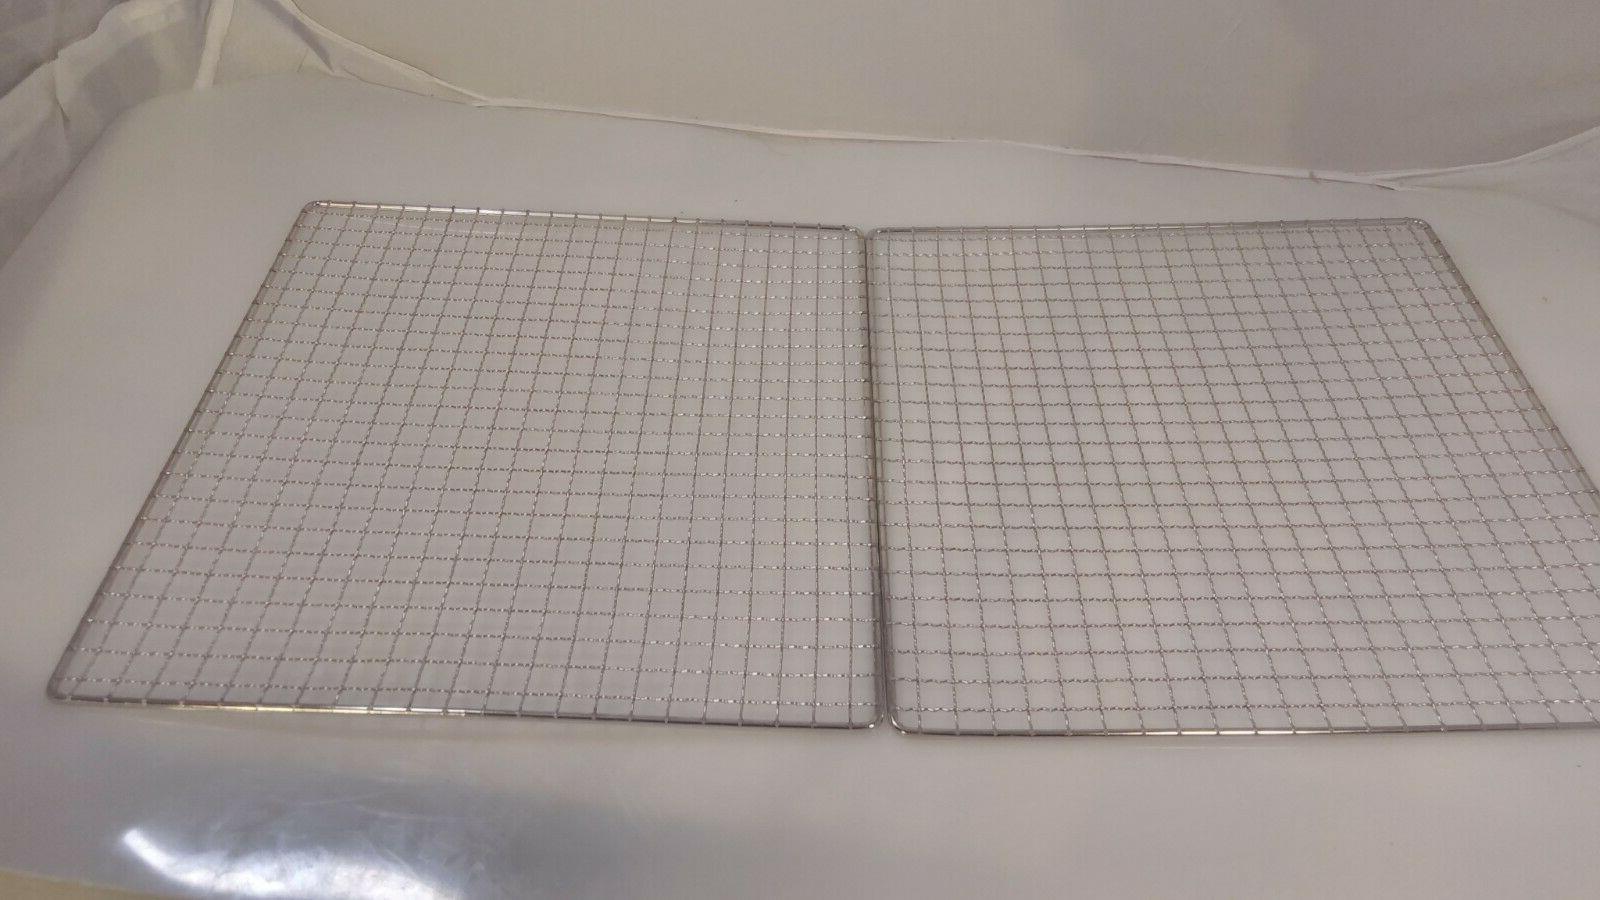 food dehydrator machine 2 stainless steel tray